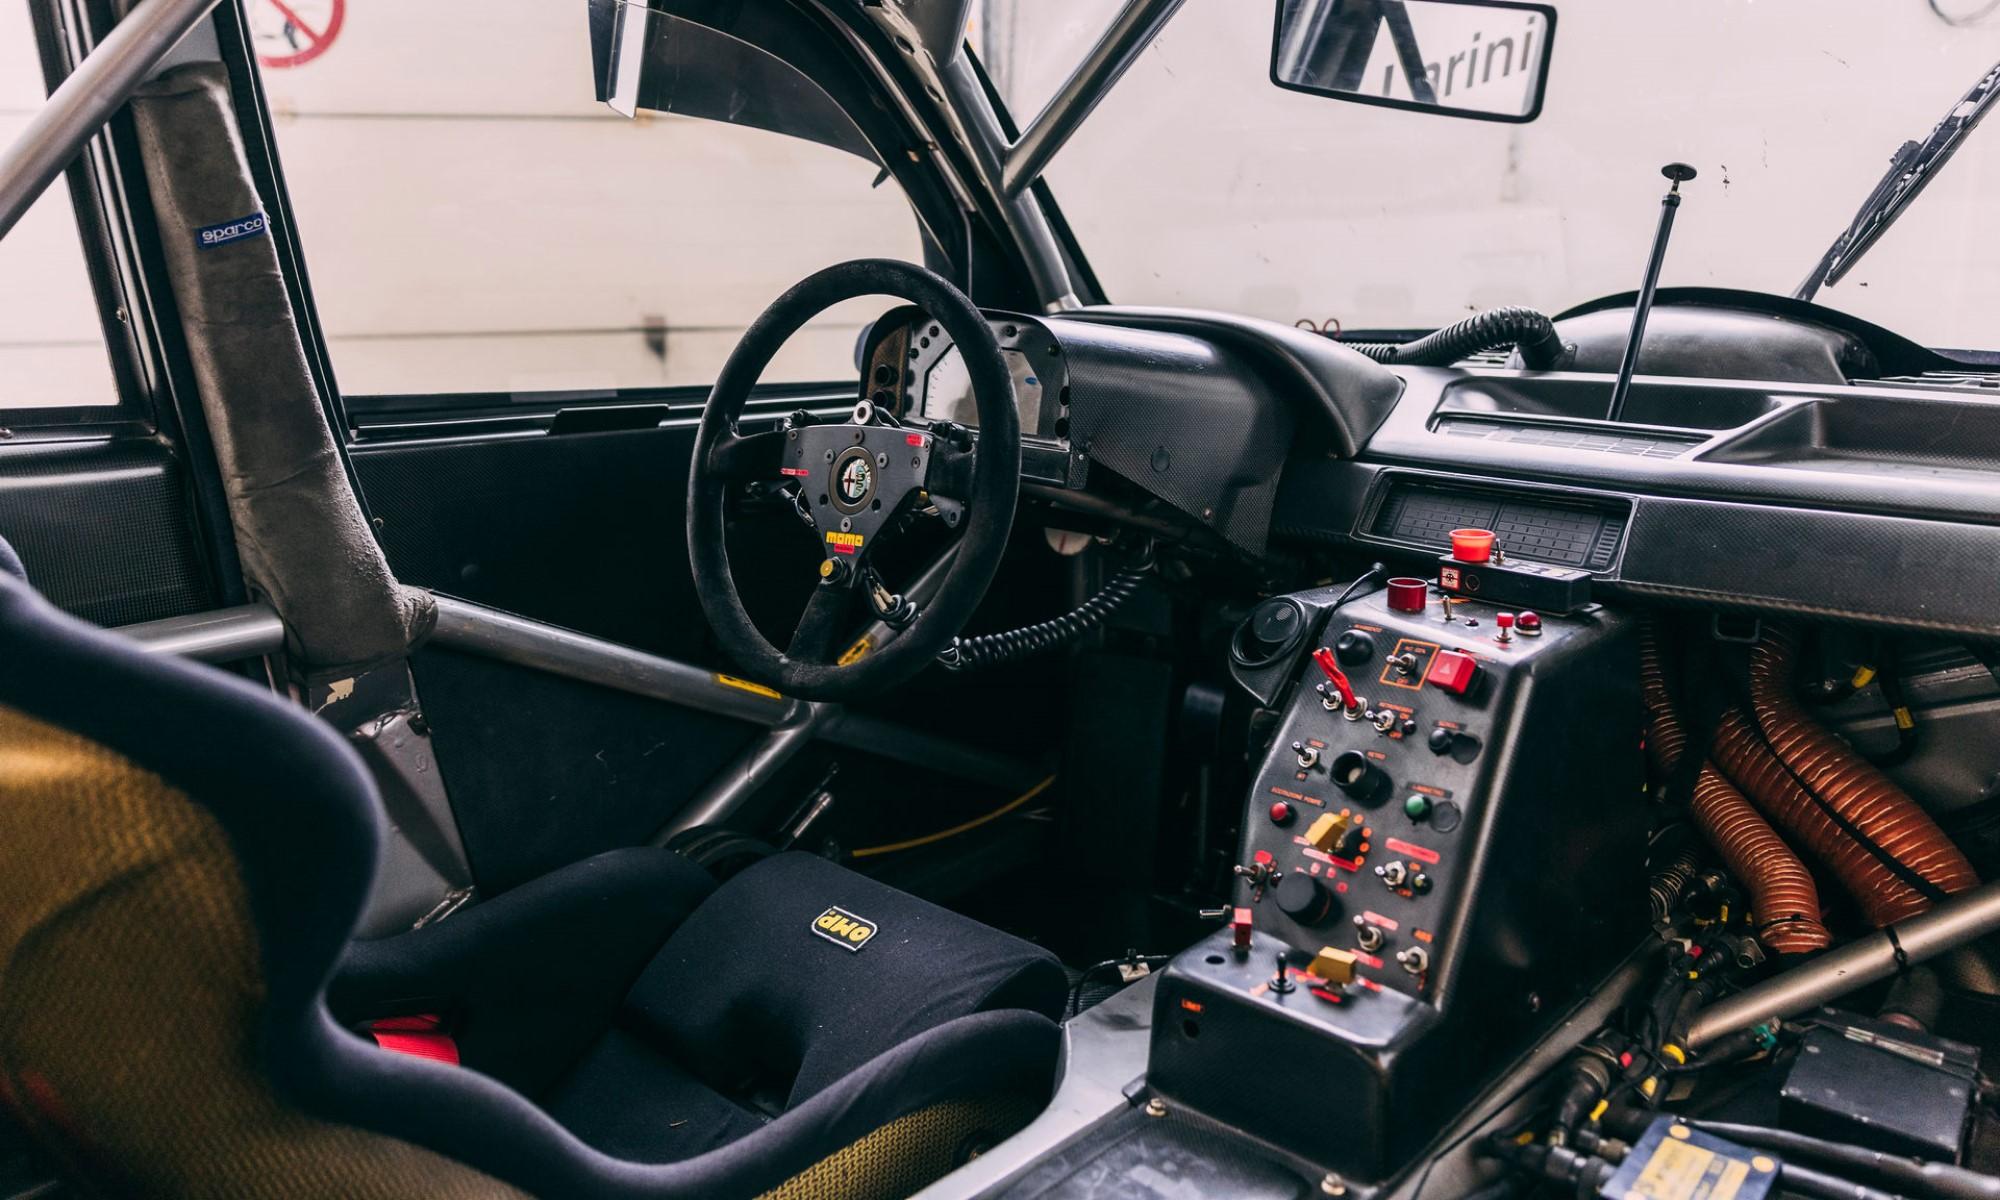 Alfa Romeo 155 V6 Ti interior